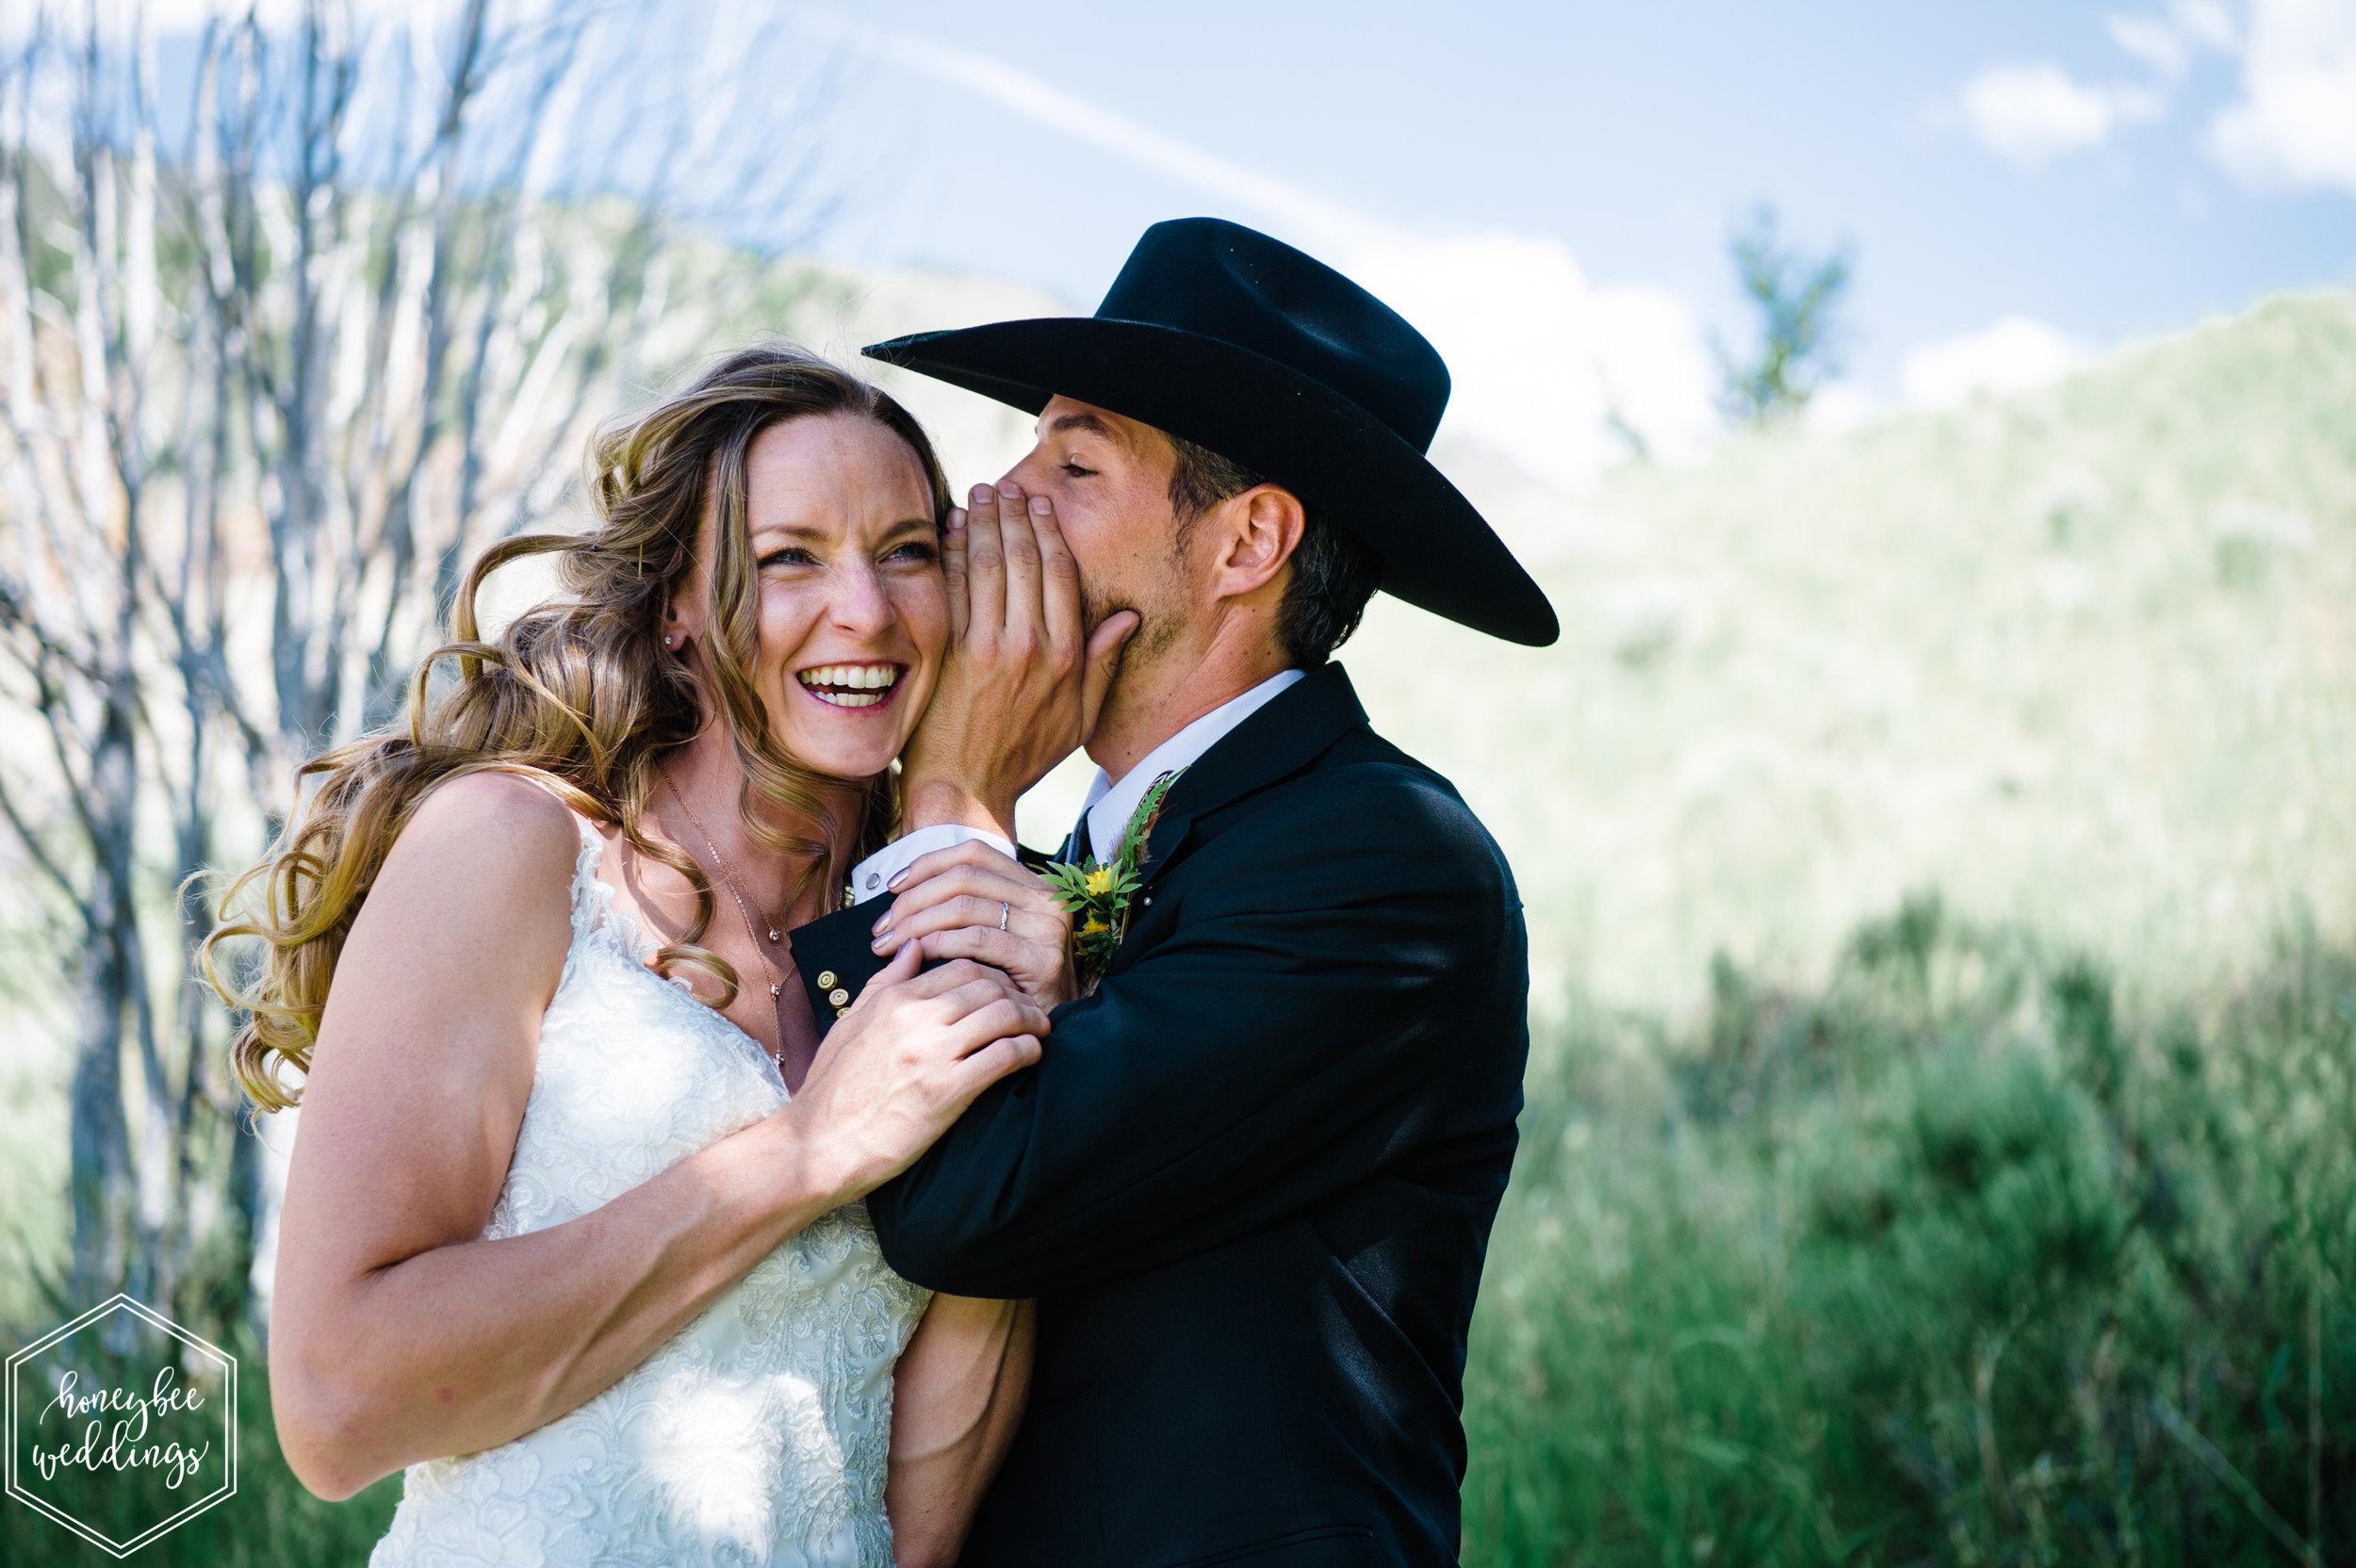 016Yellowstone National Park Wedding_Montana Wedding Photographer_Honeybee Weddings_Shannon & Jonathan_June 29, 2019-201.jpg